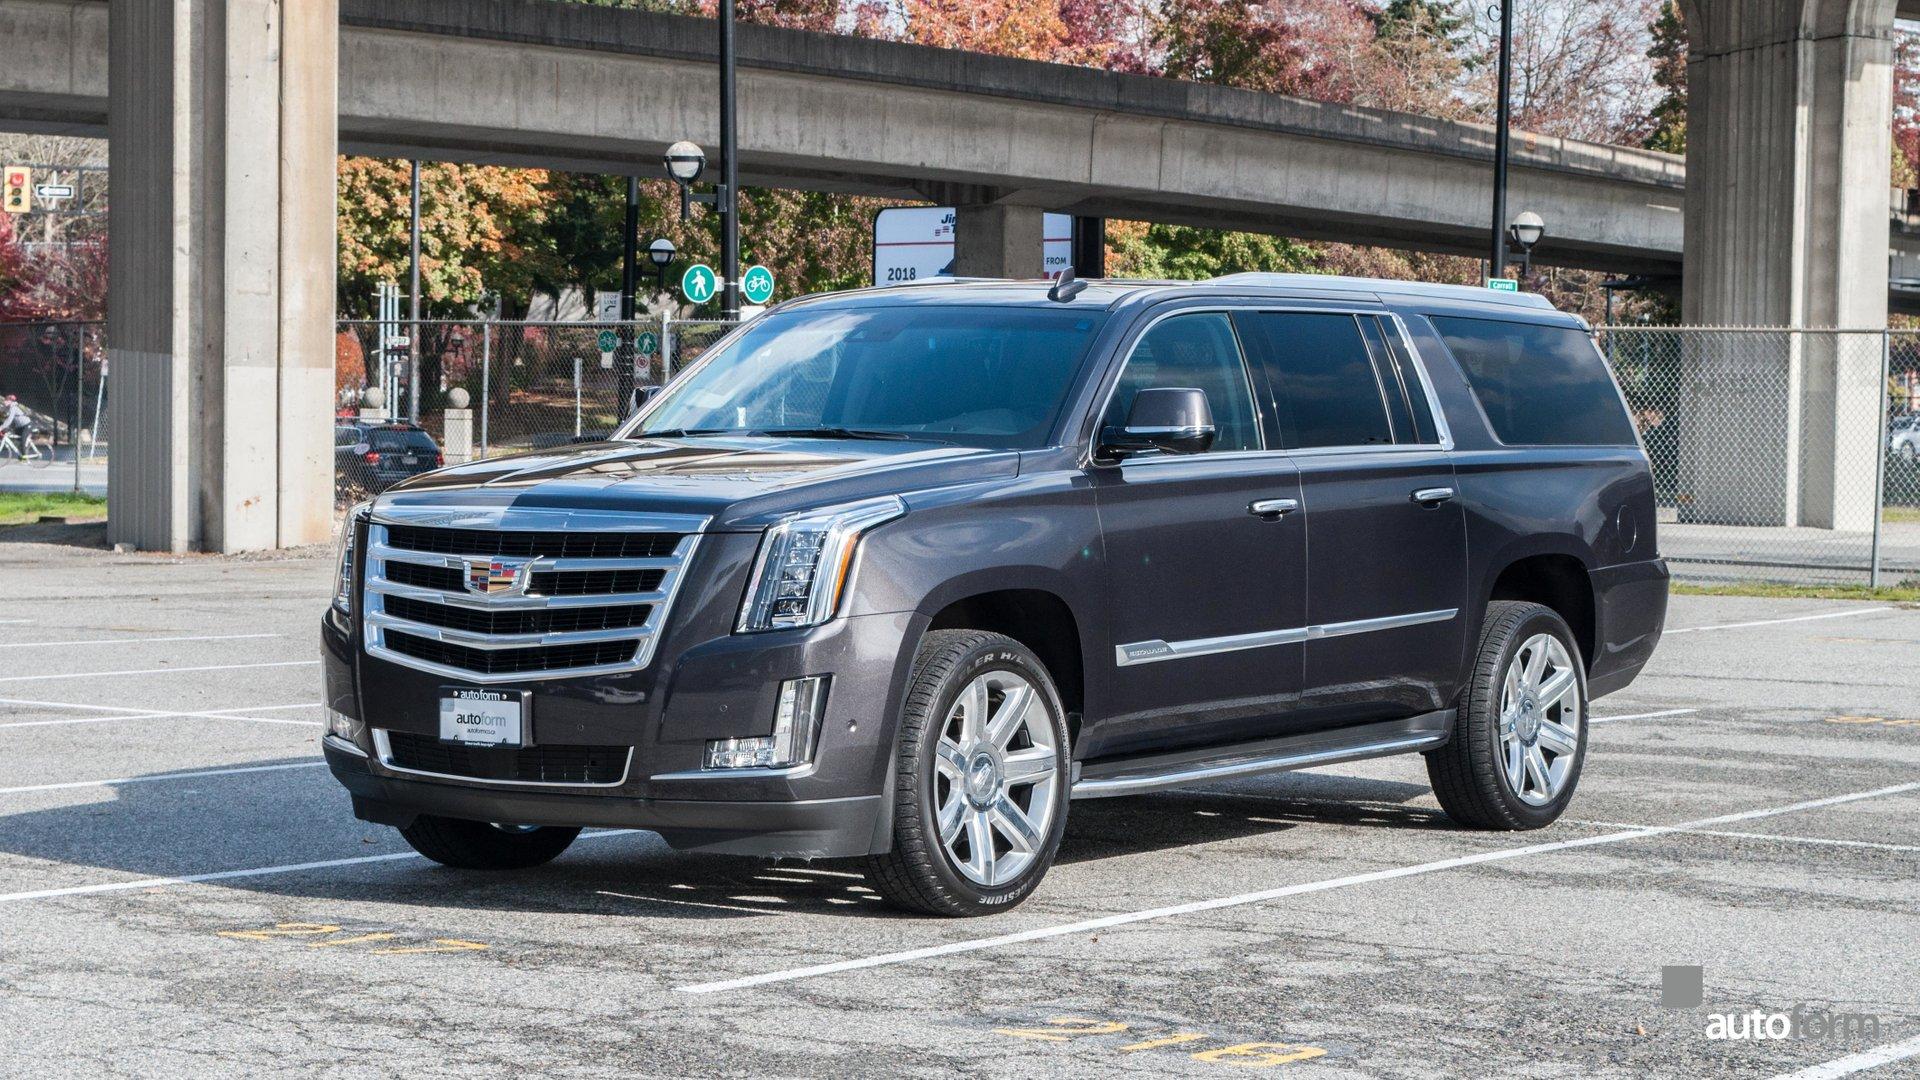 2017 Cadillac Escalade Esv Premium Luxury >> 2017 Cadillac Escalade Esv Premium Luxury Autoform